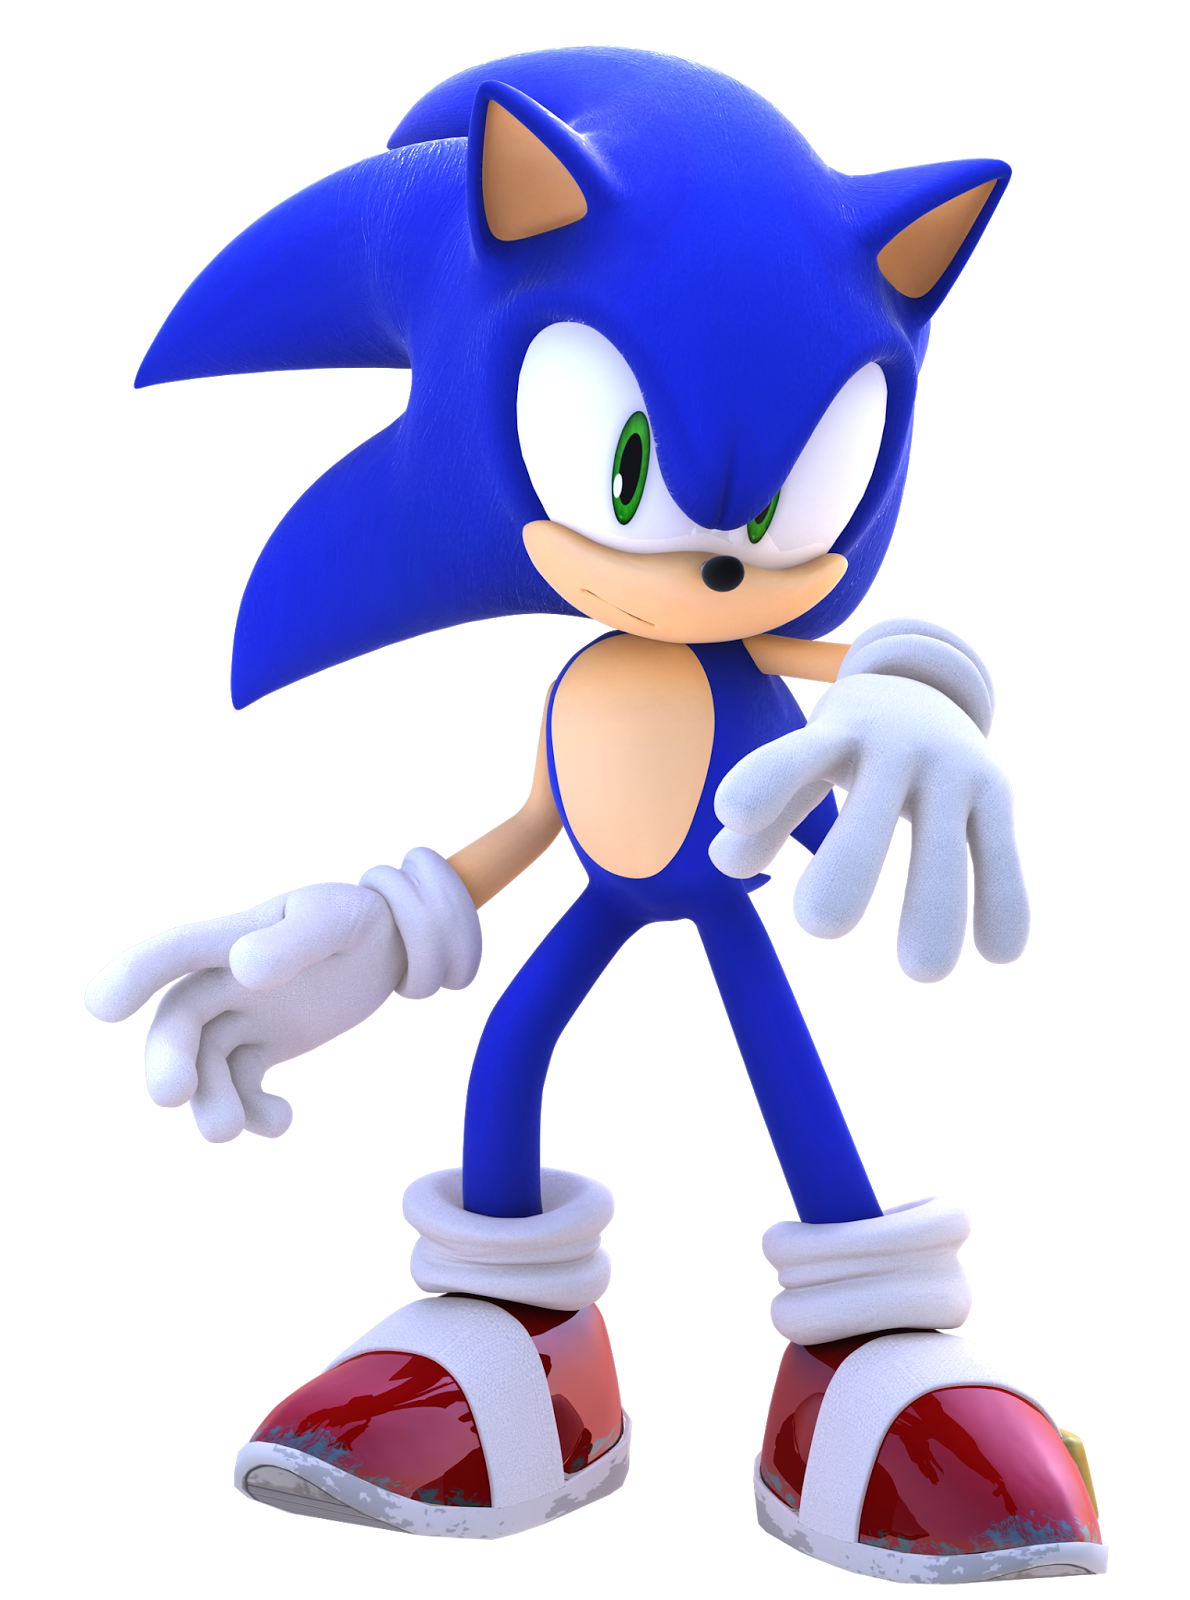 sonic the hedgehog - photo #21